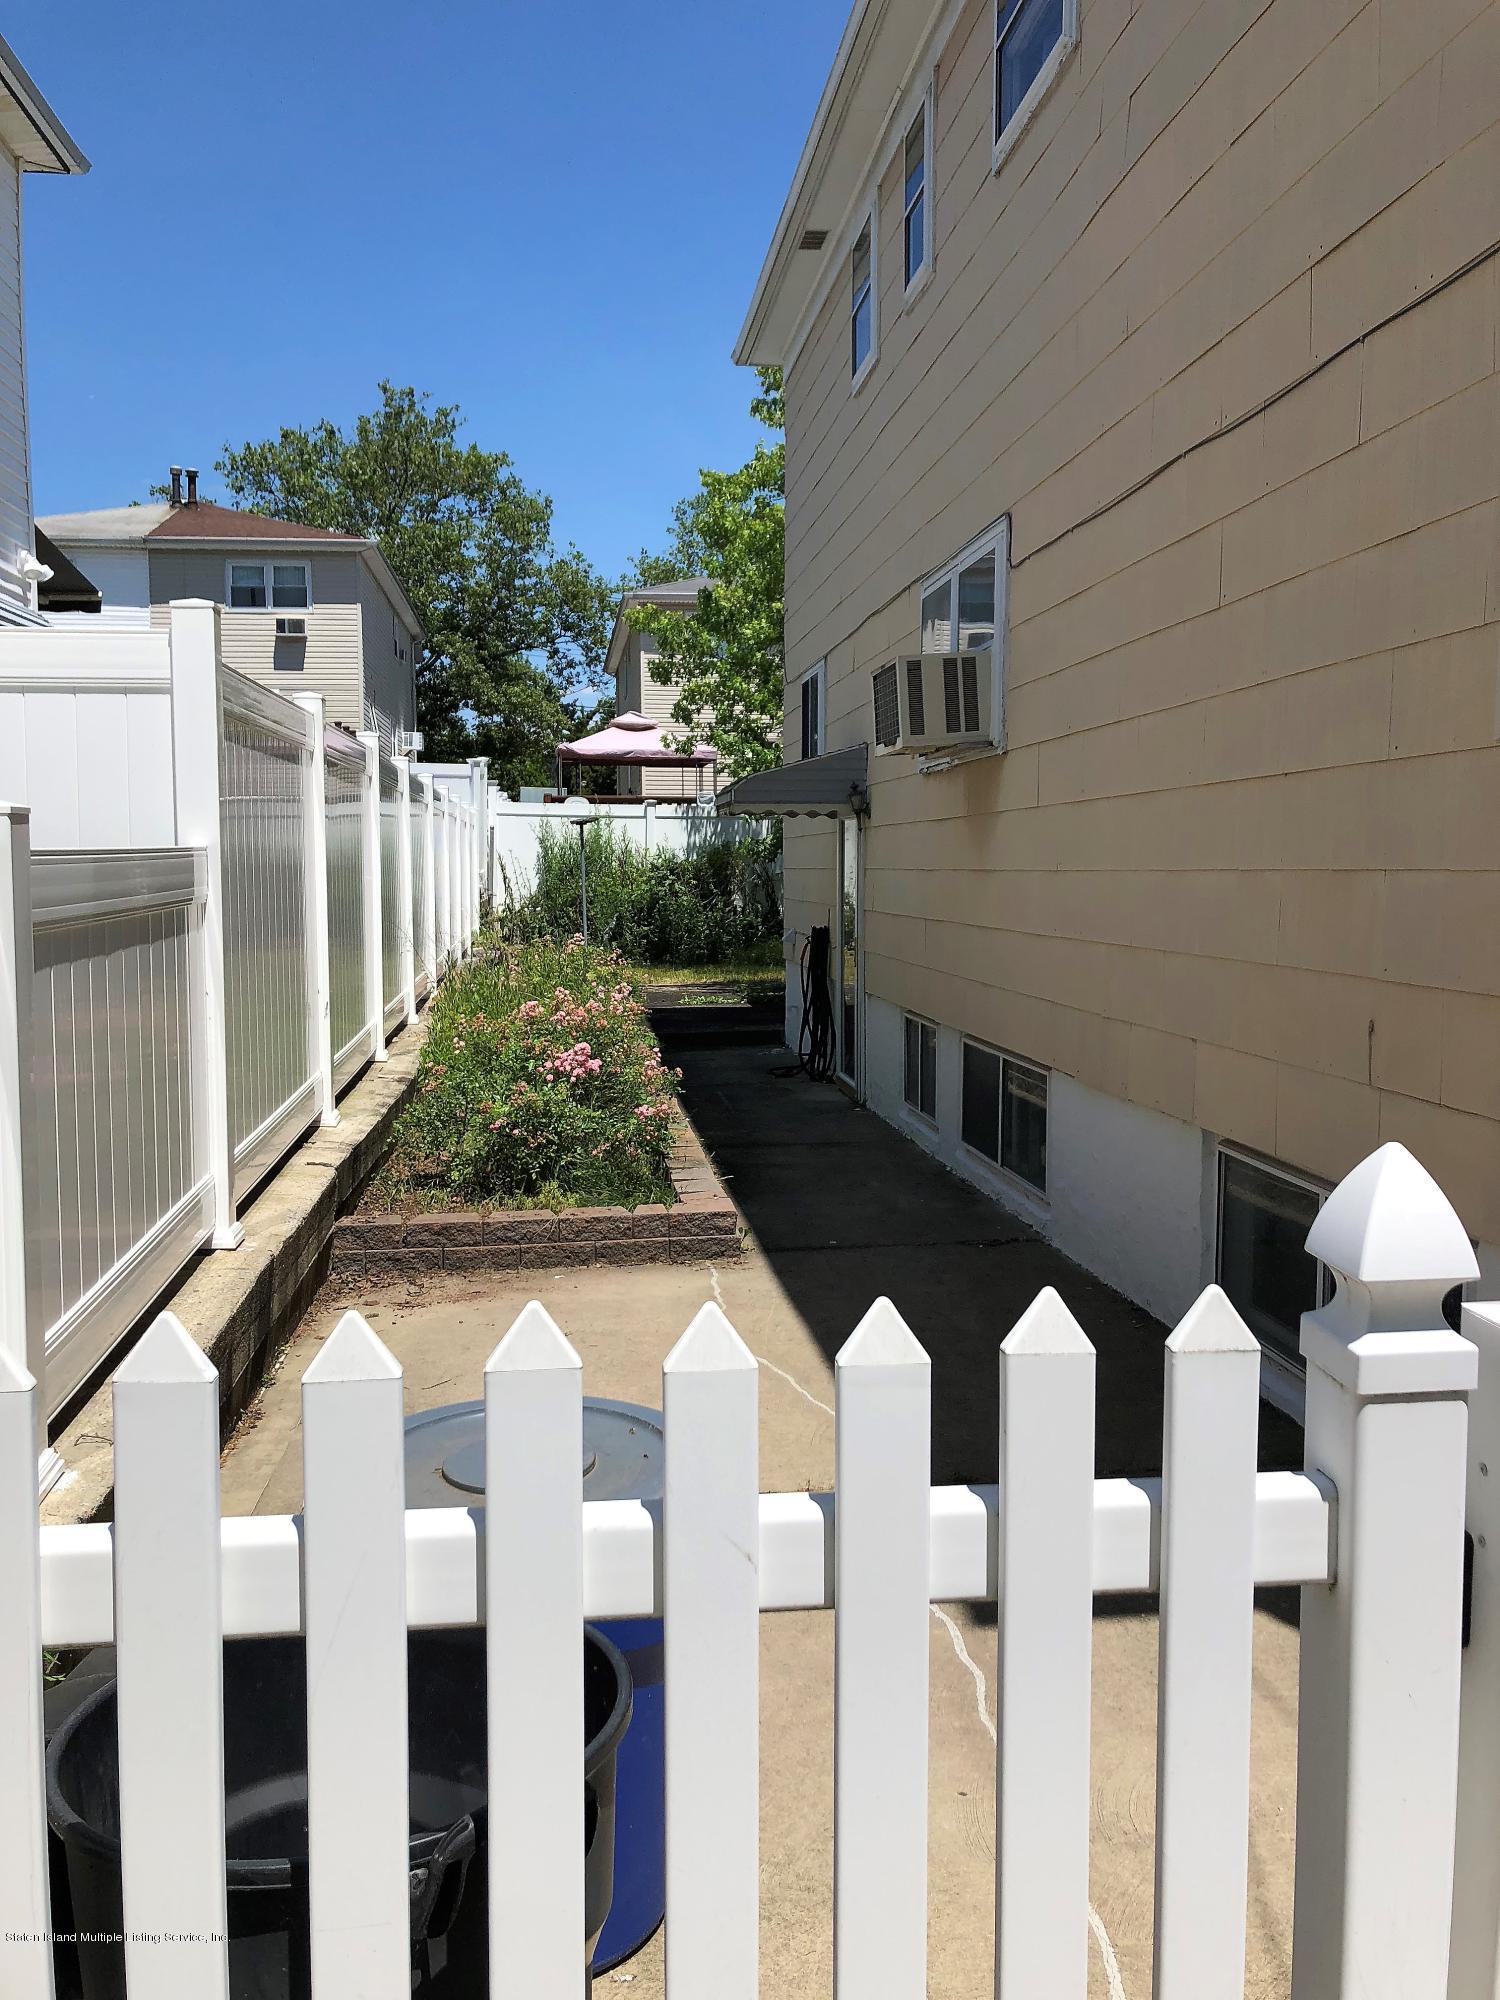 Single Family - Semi-Attached 67 Cranford Street  Staten Island, NY 10308, MLS-1130182-2